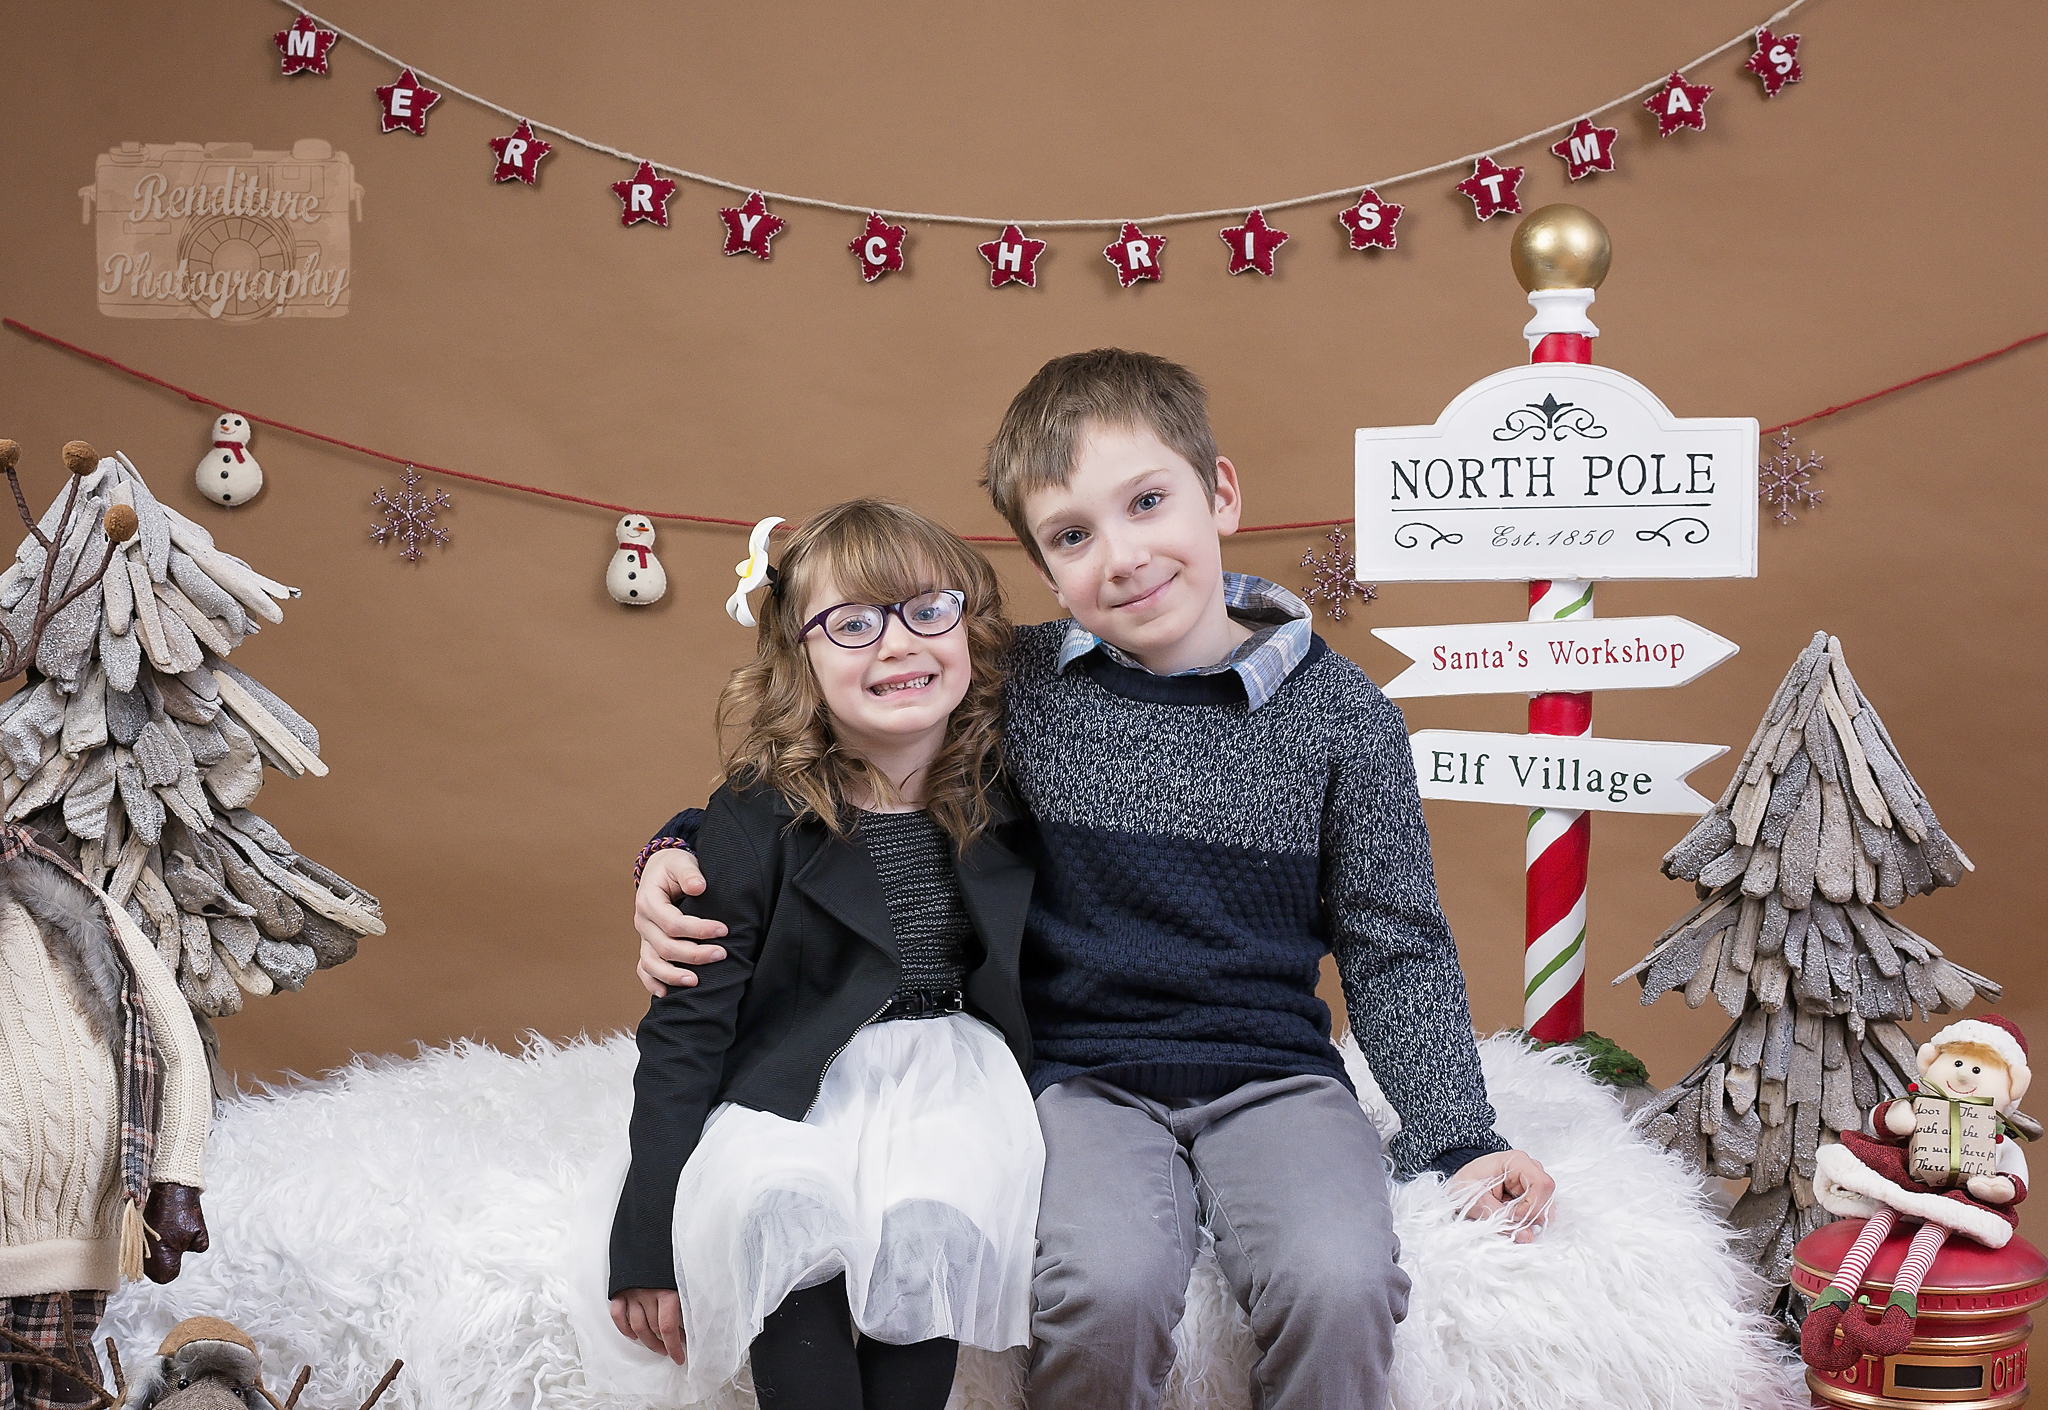 Saskatoon-Newborn-Family-Renditure-Mini-Session-Photography-Photographer-Christmas-Holiday-Saskatchewan-480FBR.jpg